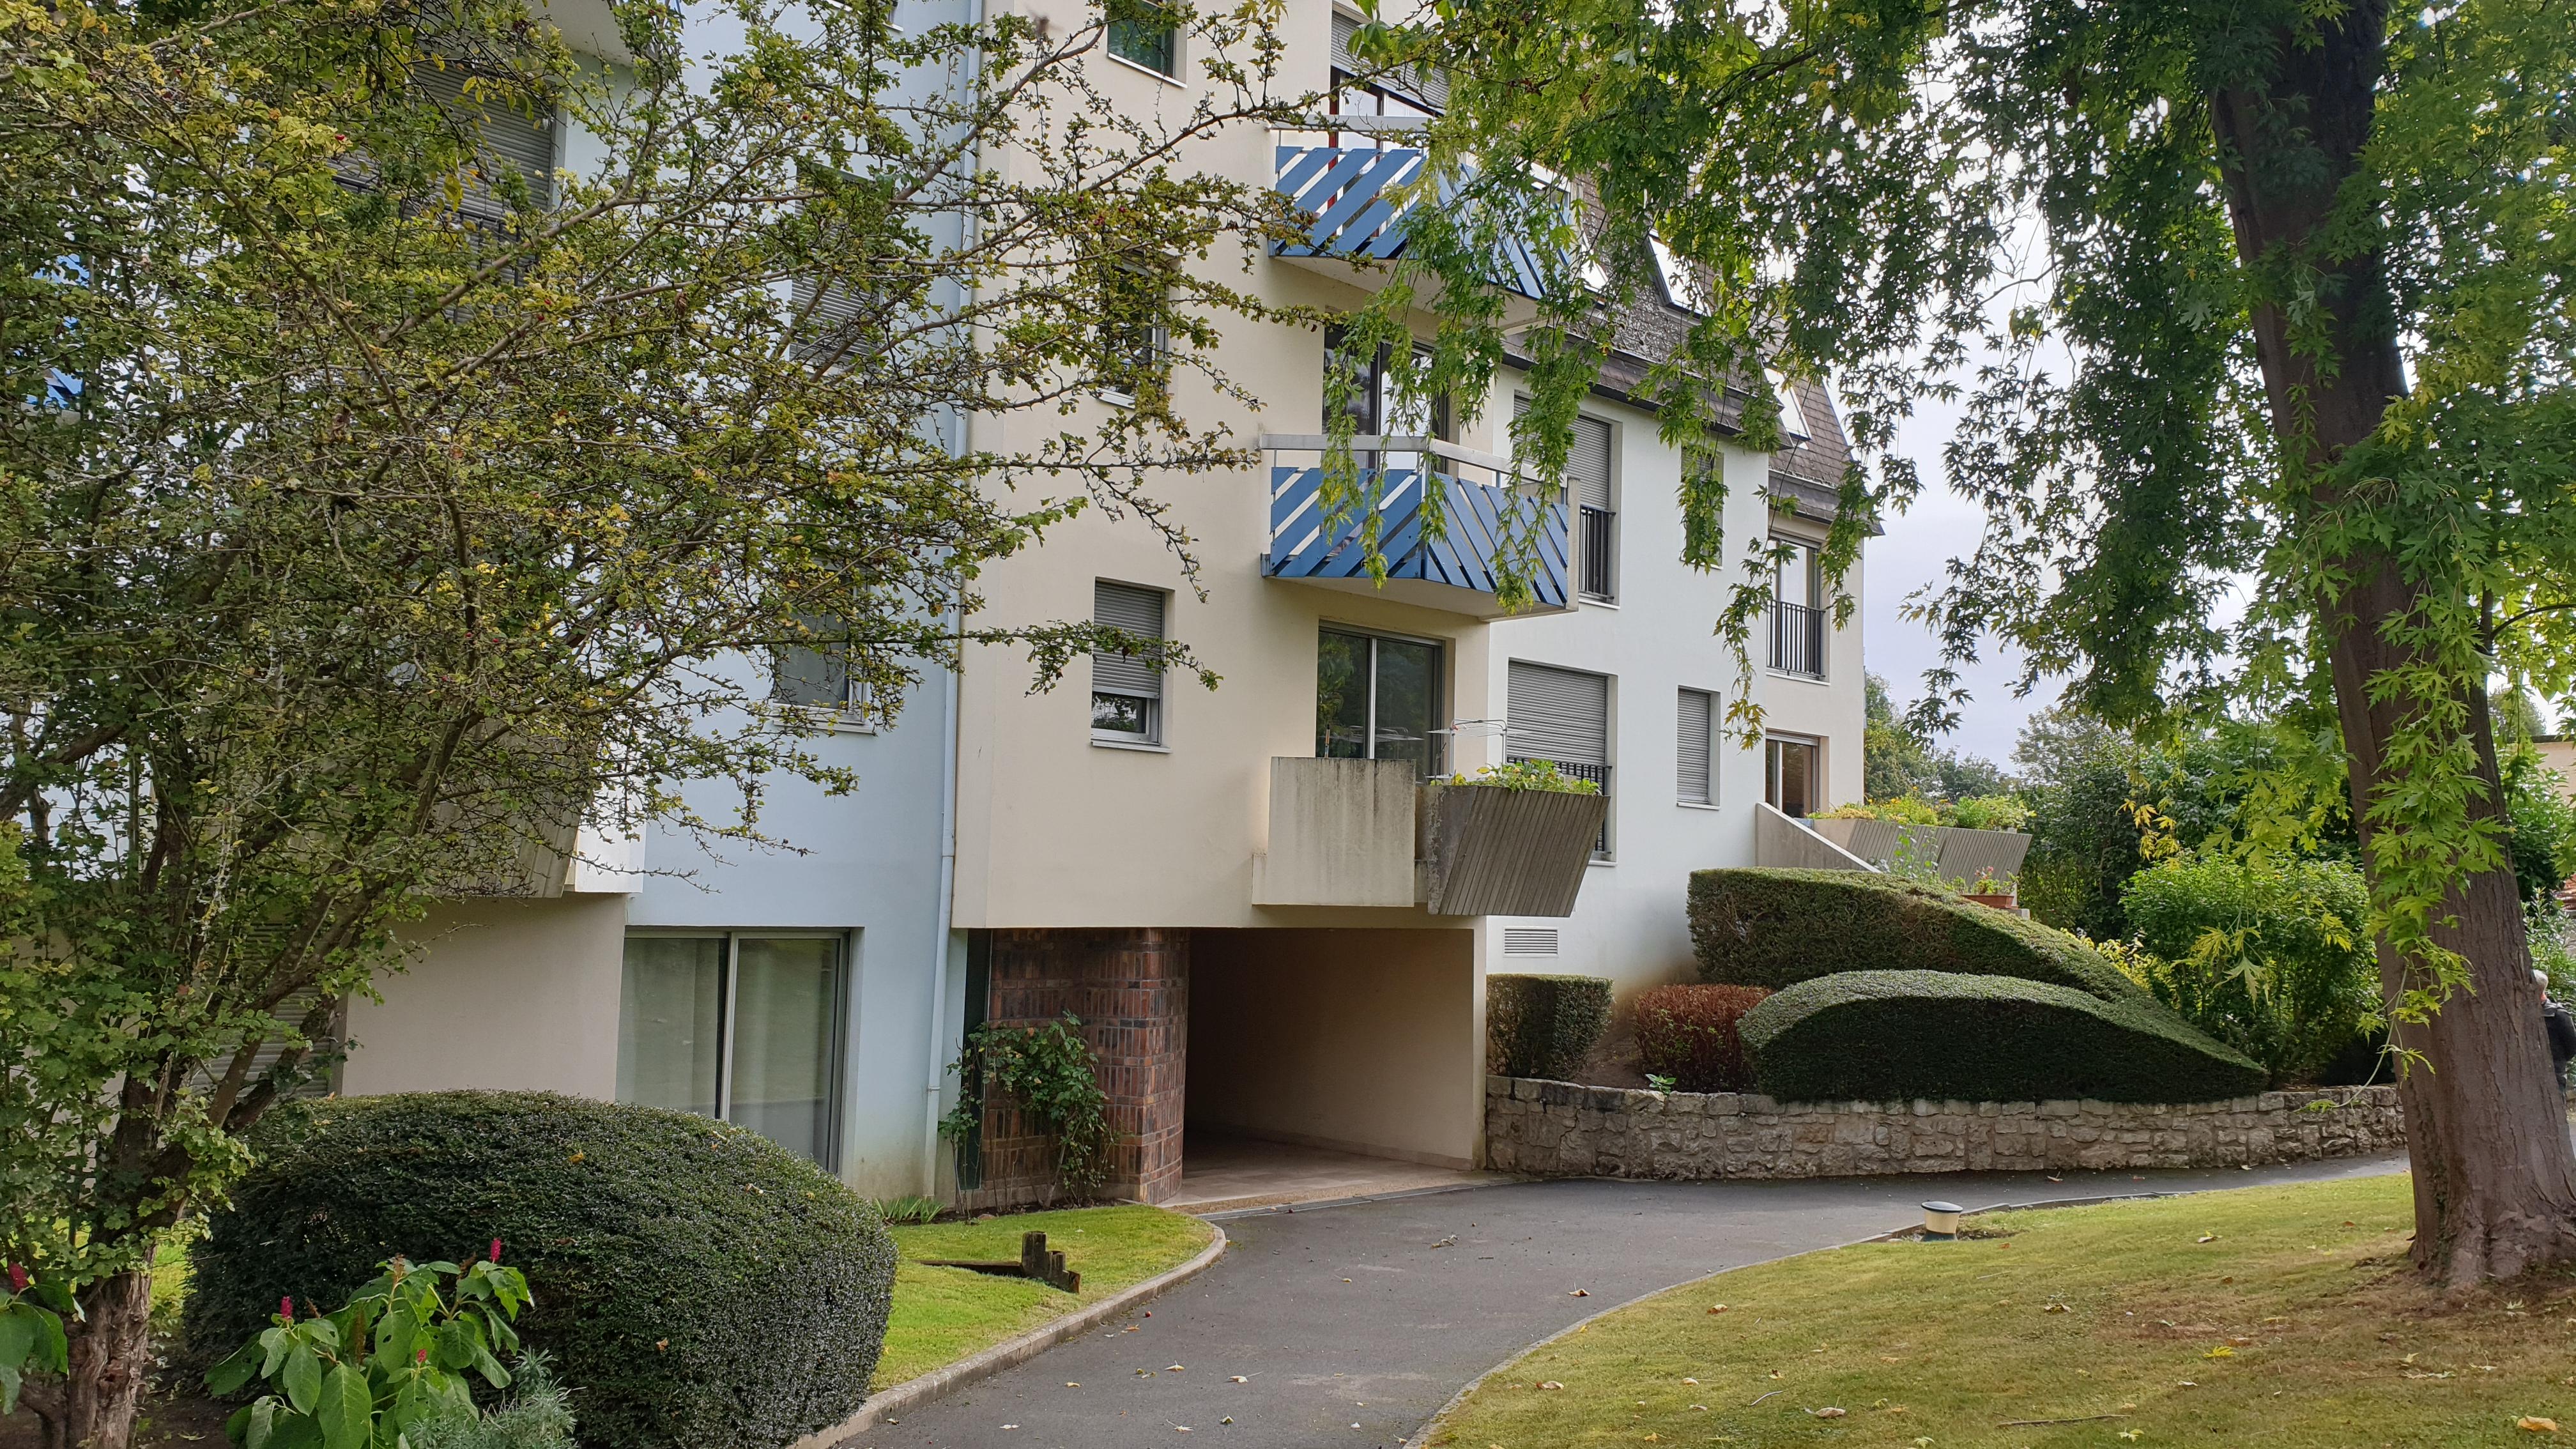 Bel appartement vue sur la Seine 158000 €